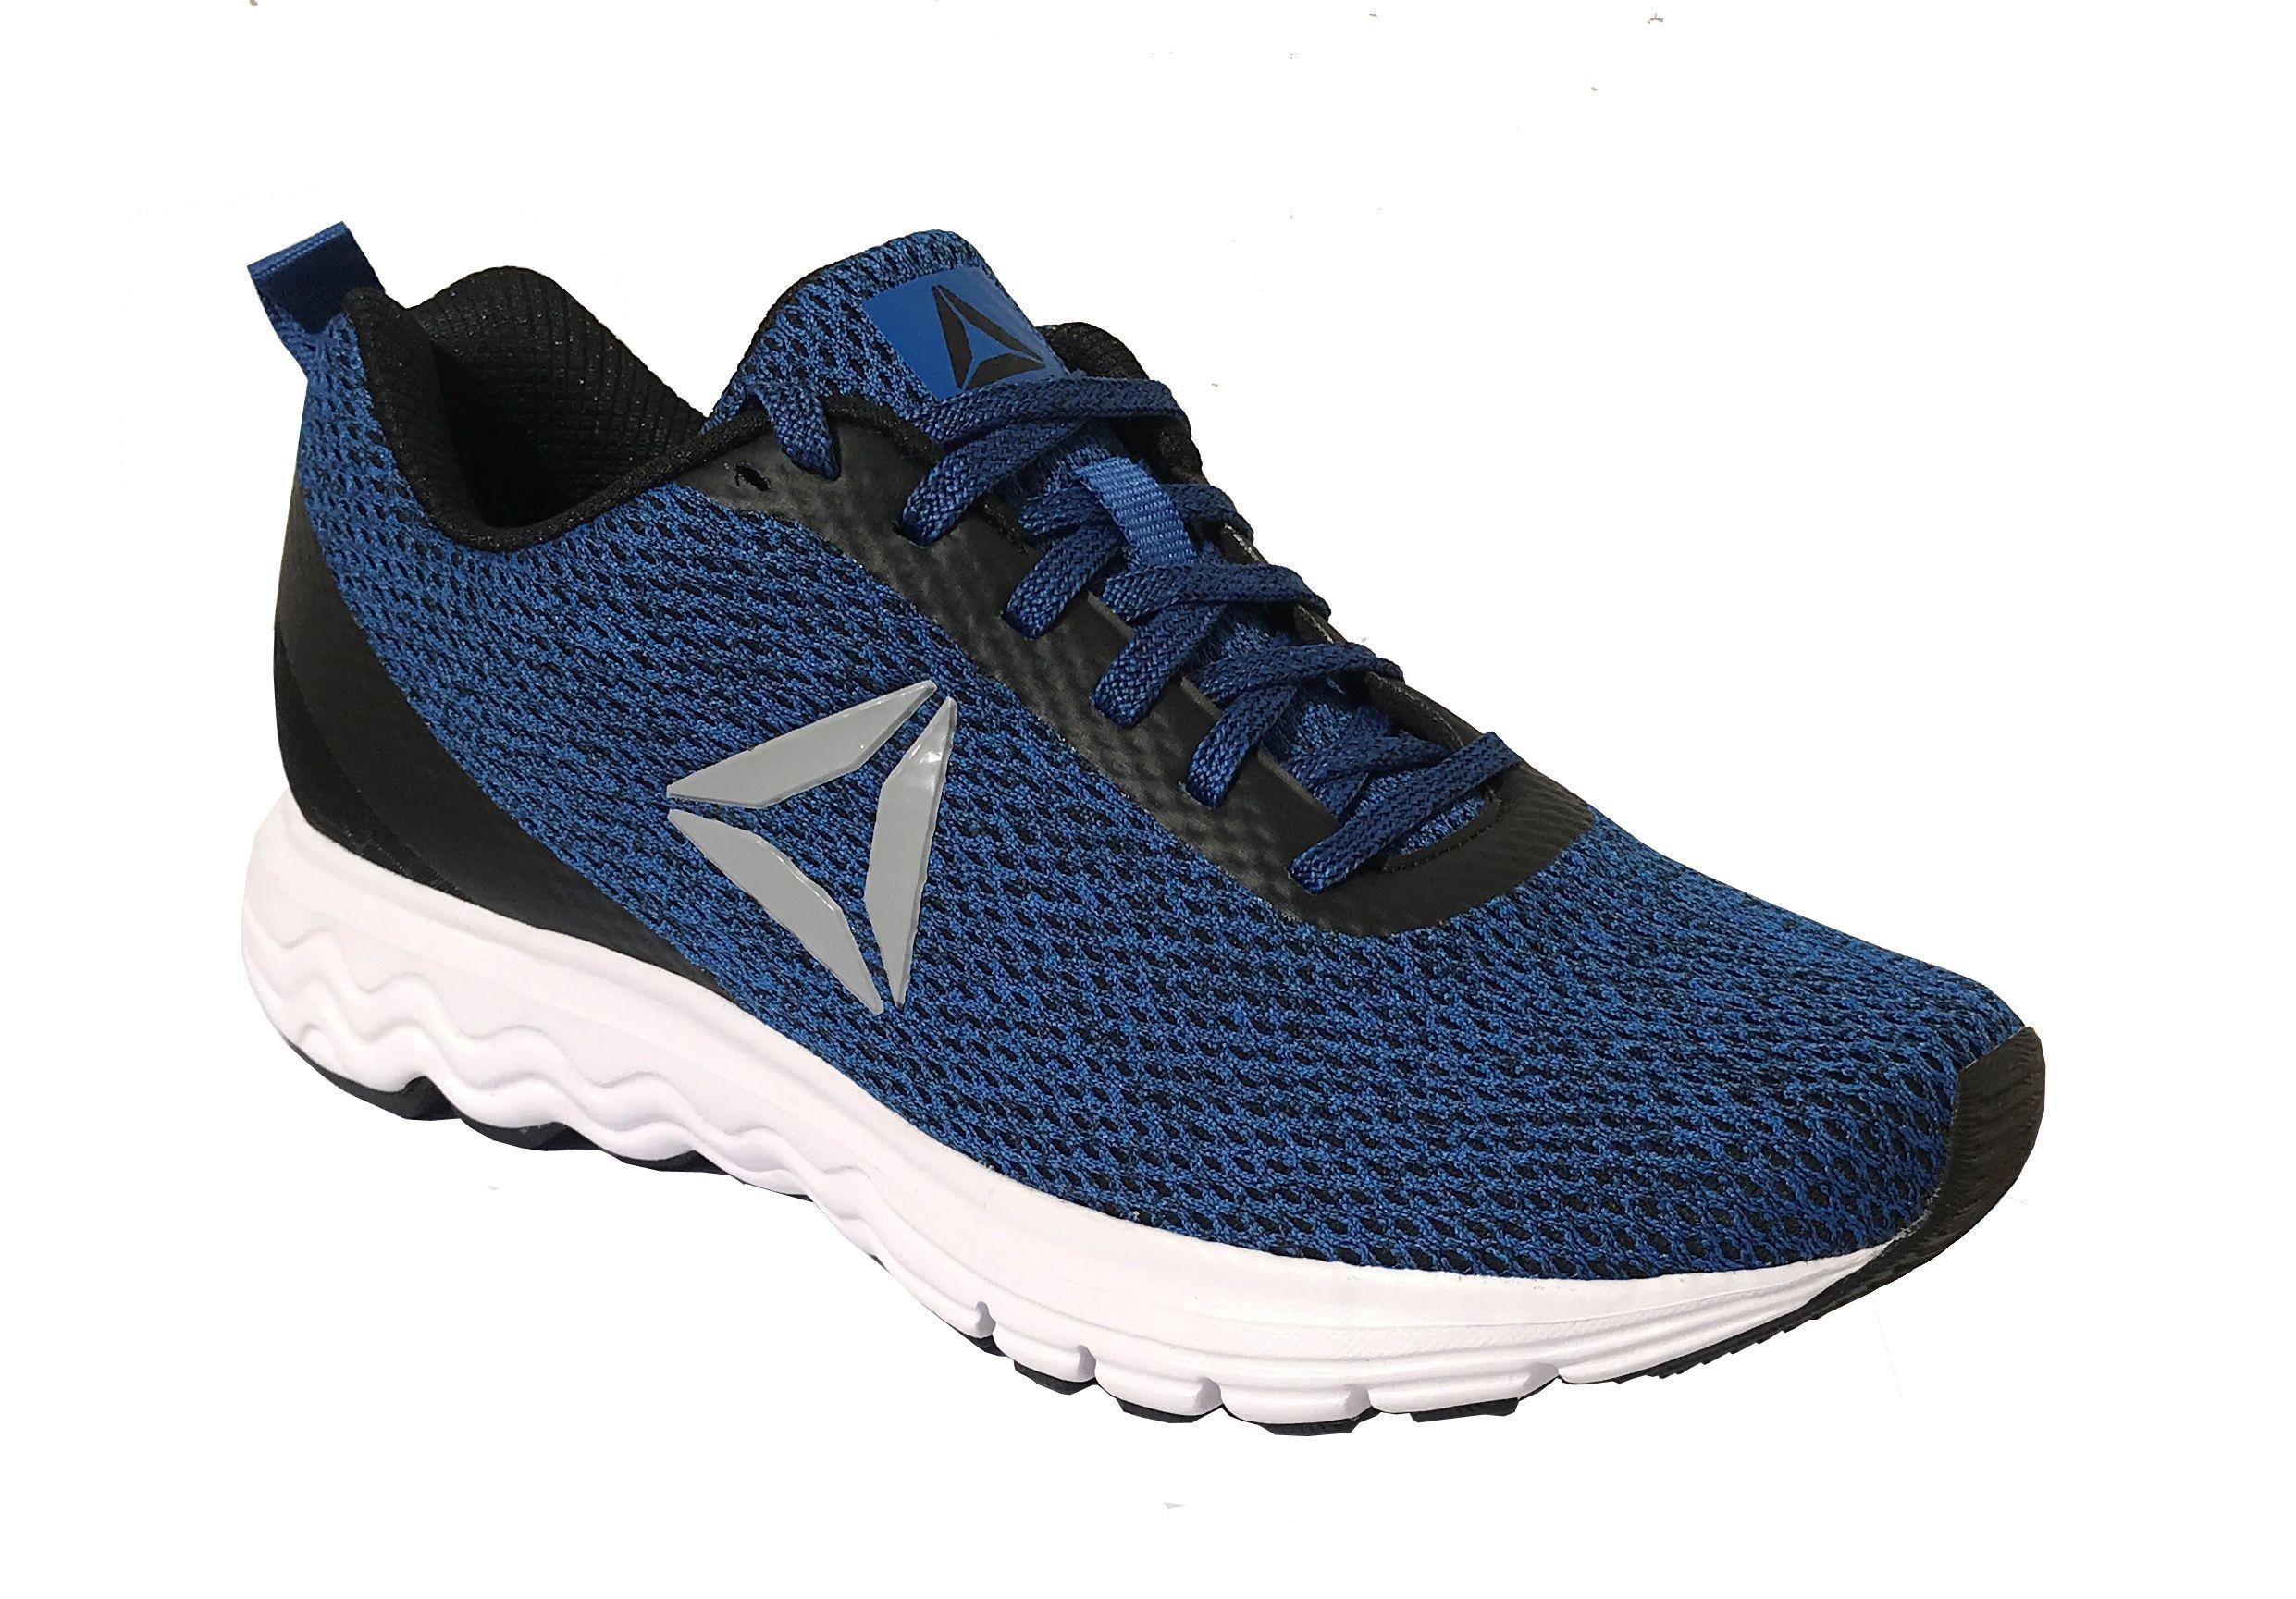 Reebok Zoom Runner Men's Blue Running Shoes ...